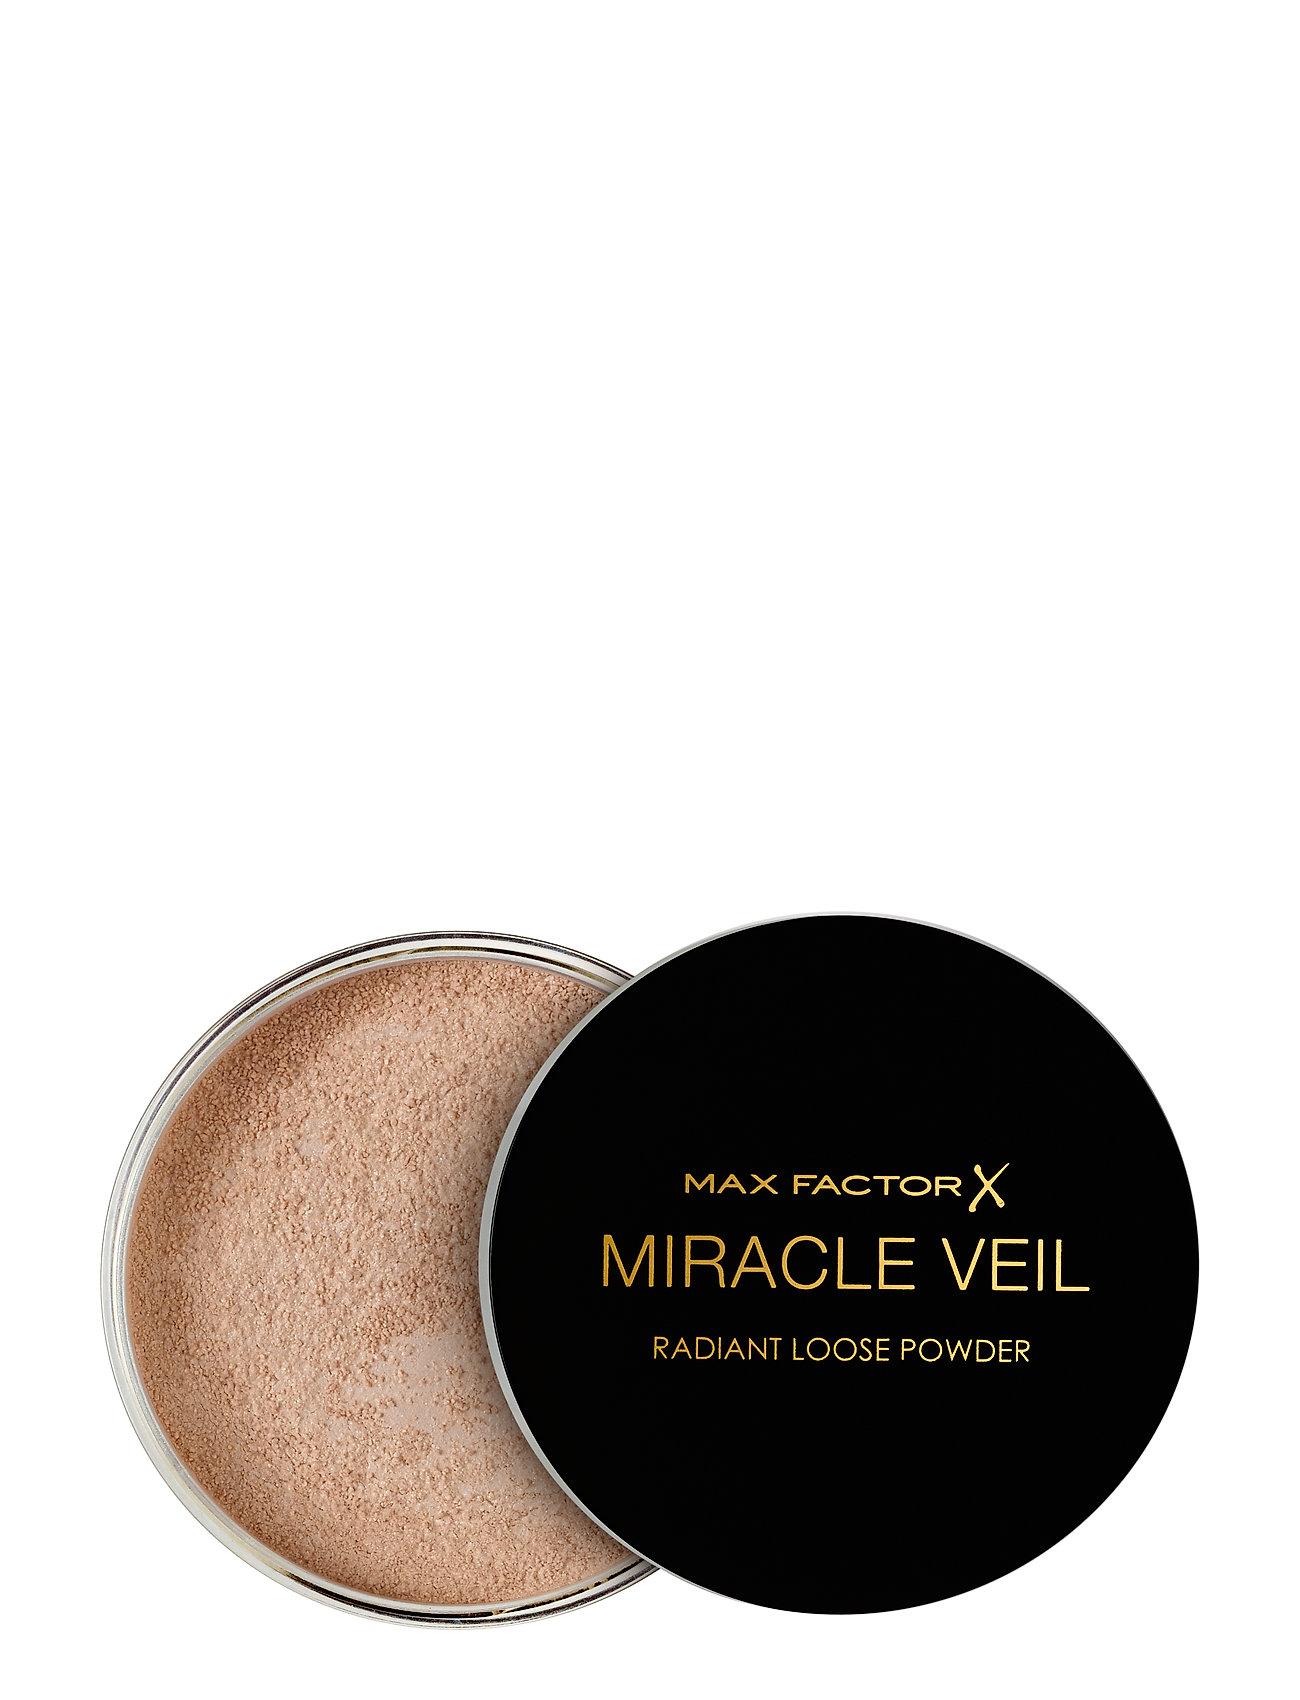 Image of Miracle Veil Loose Powder Translucent Pudder Makeup Max Factor (3308422361)